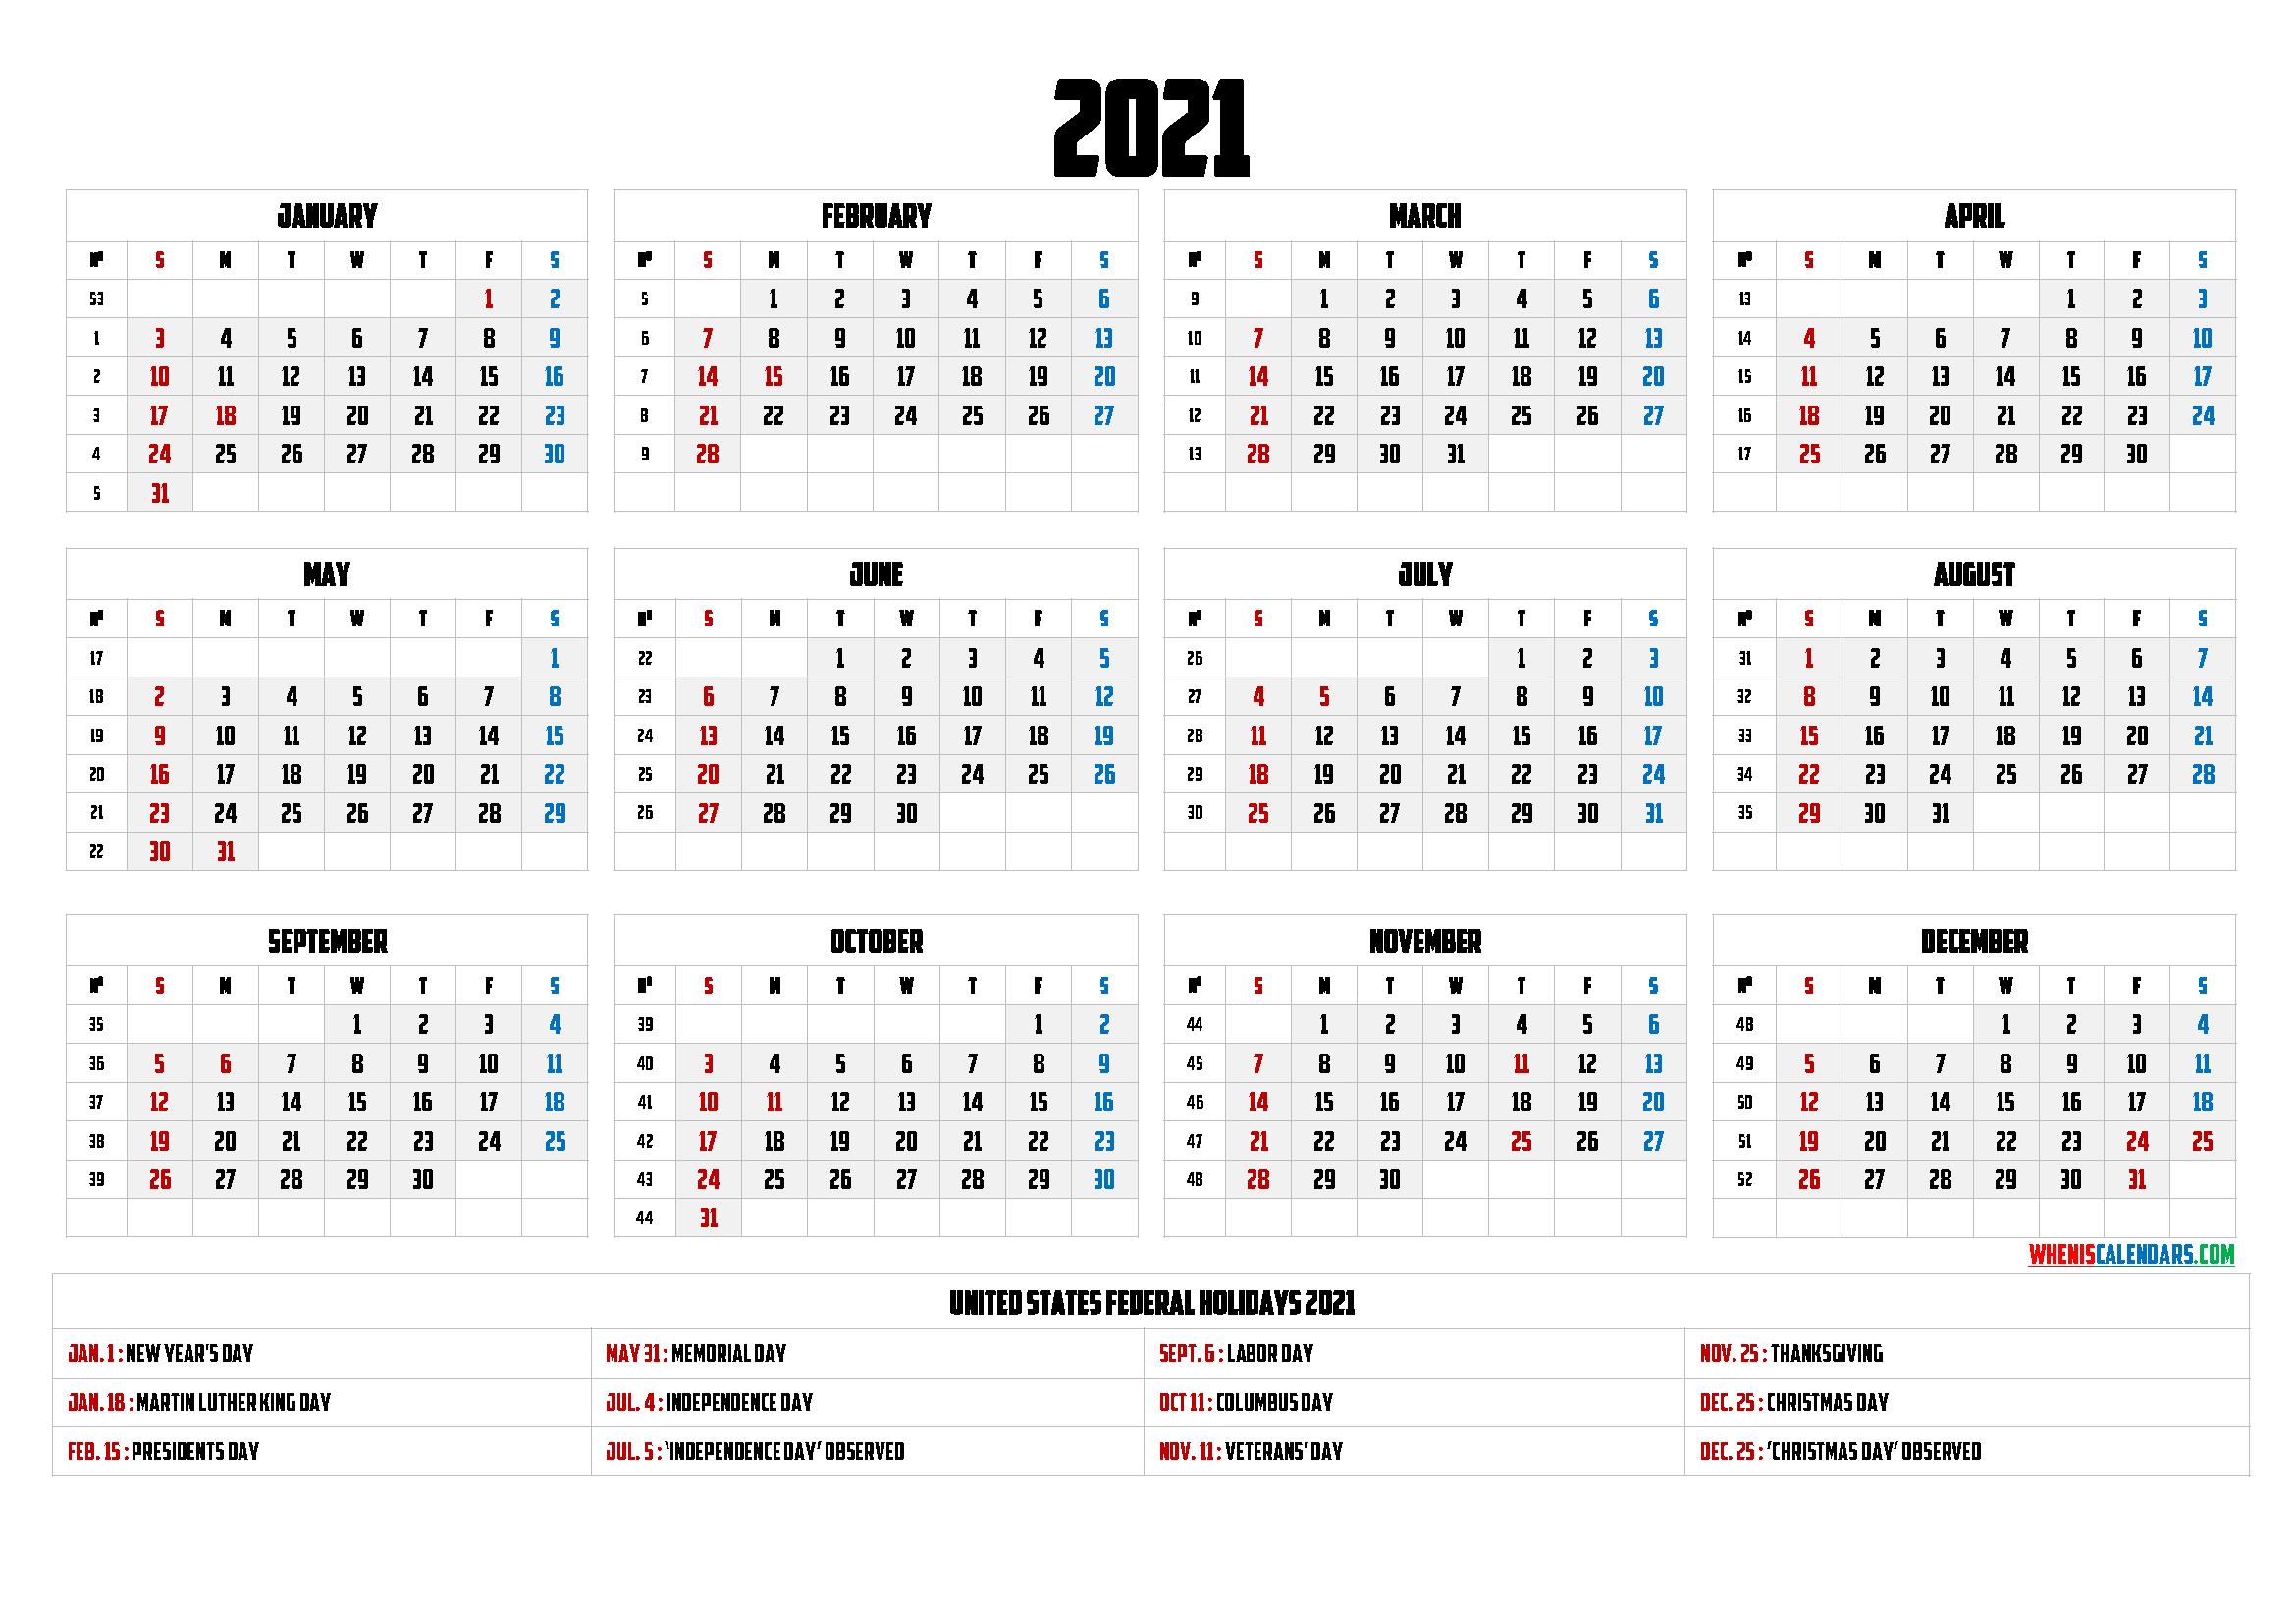 Free Printable 2021 Calendar With Holidays - 9 Templates-Fillable Calendar 2021-2021 Year